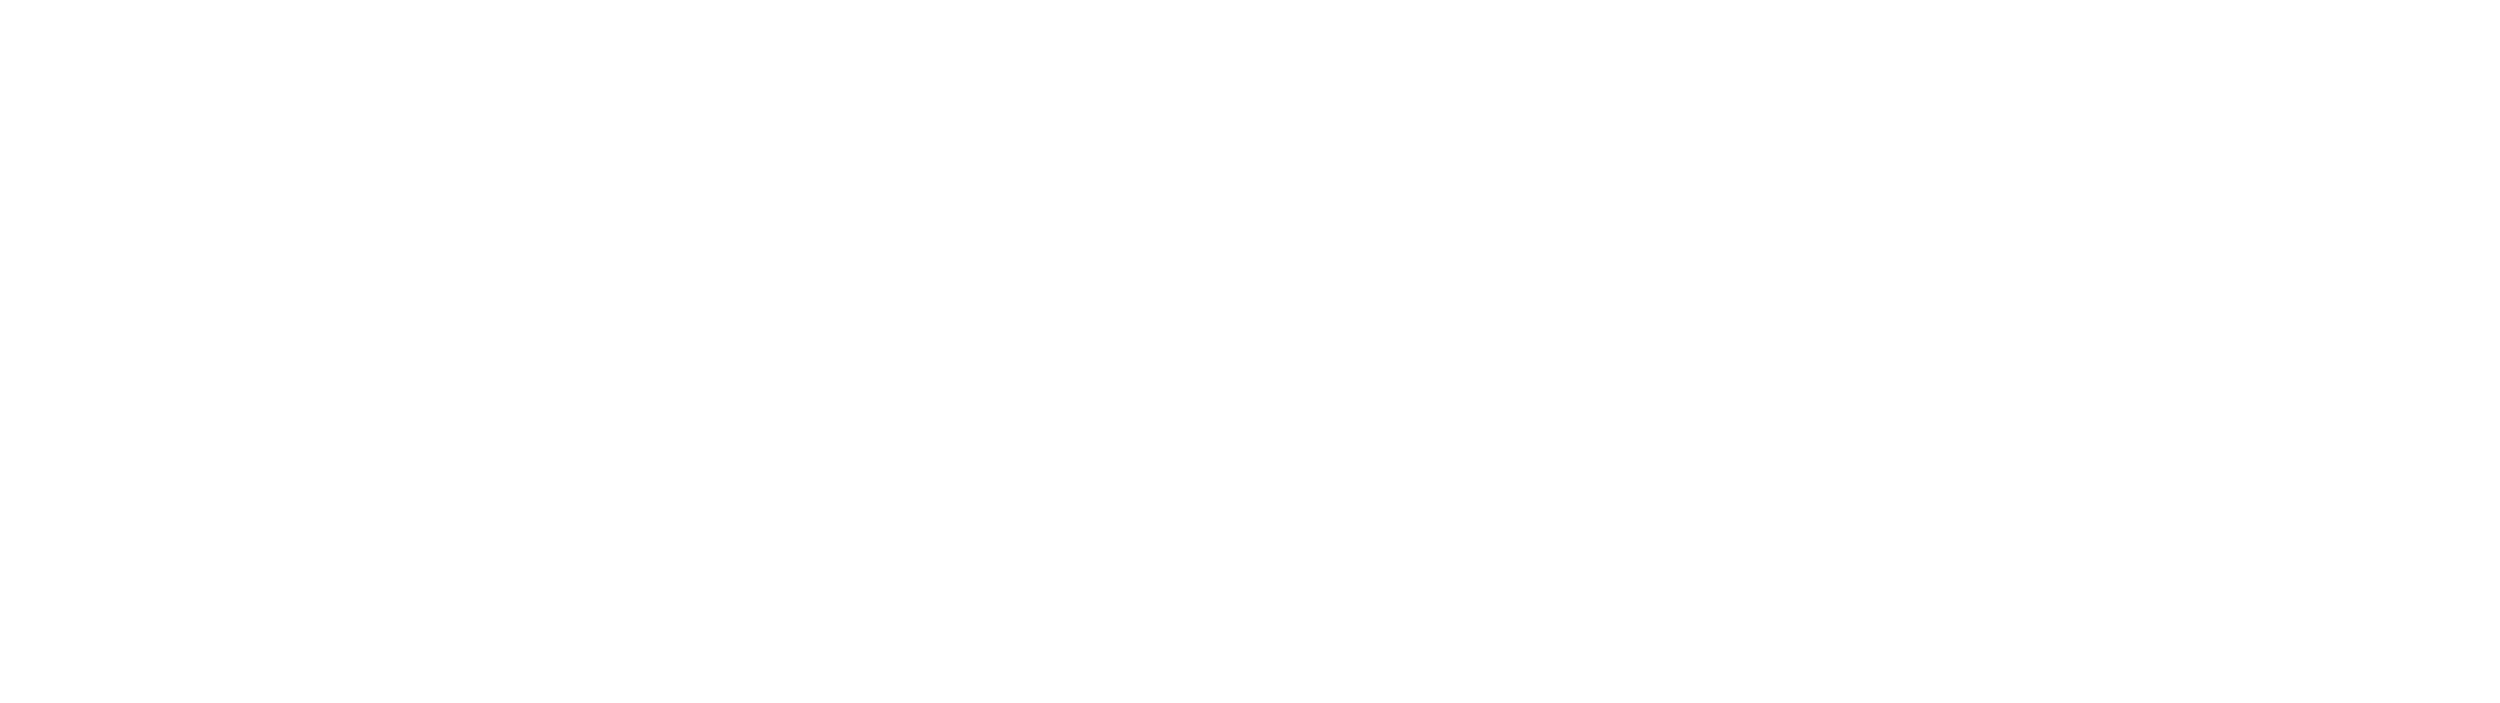 Studio Rentals-01.png